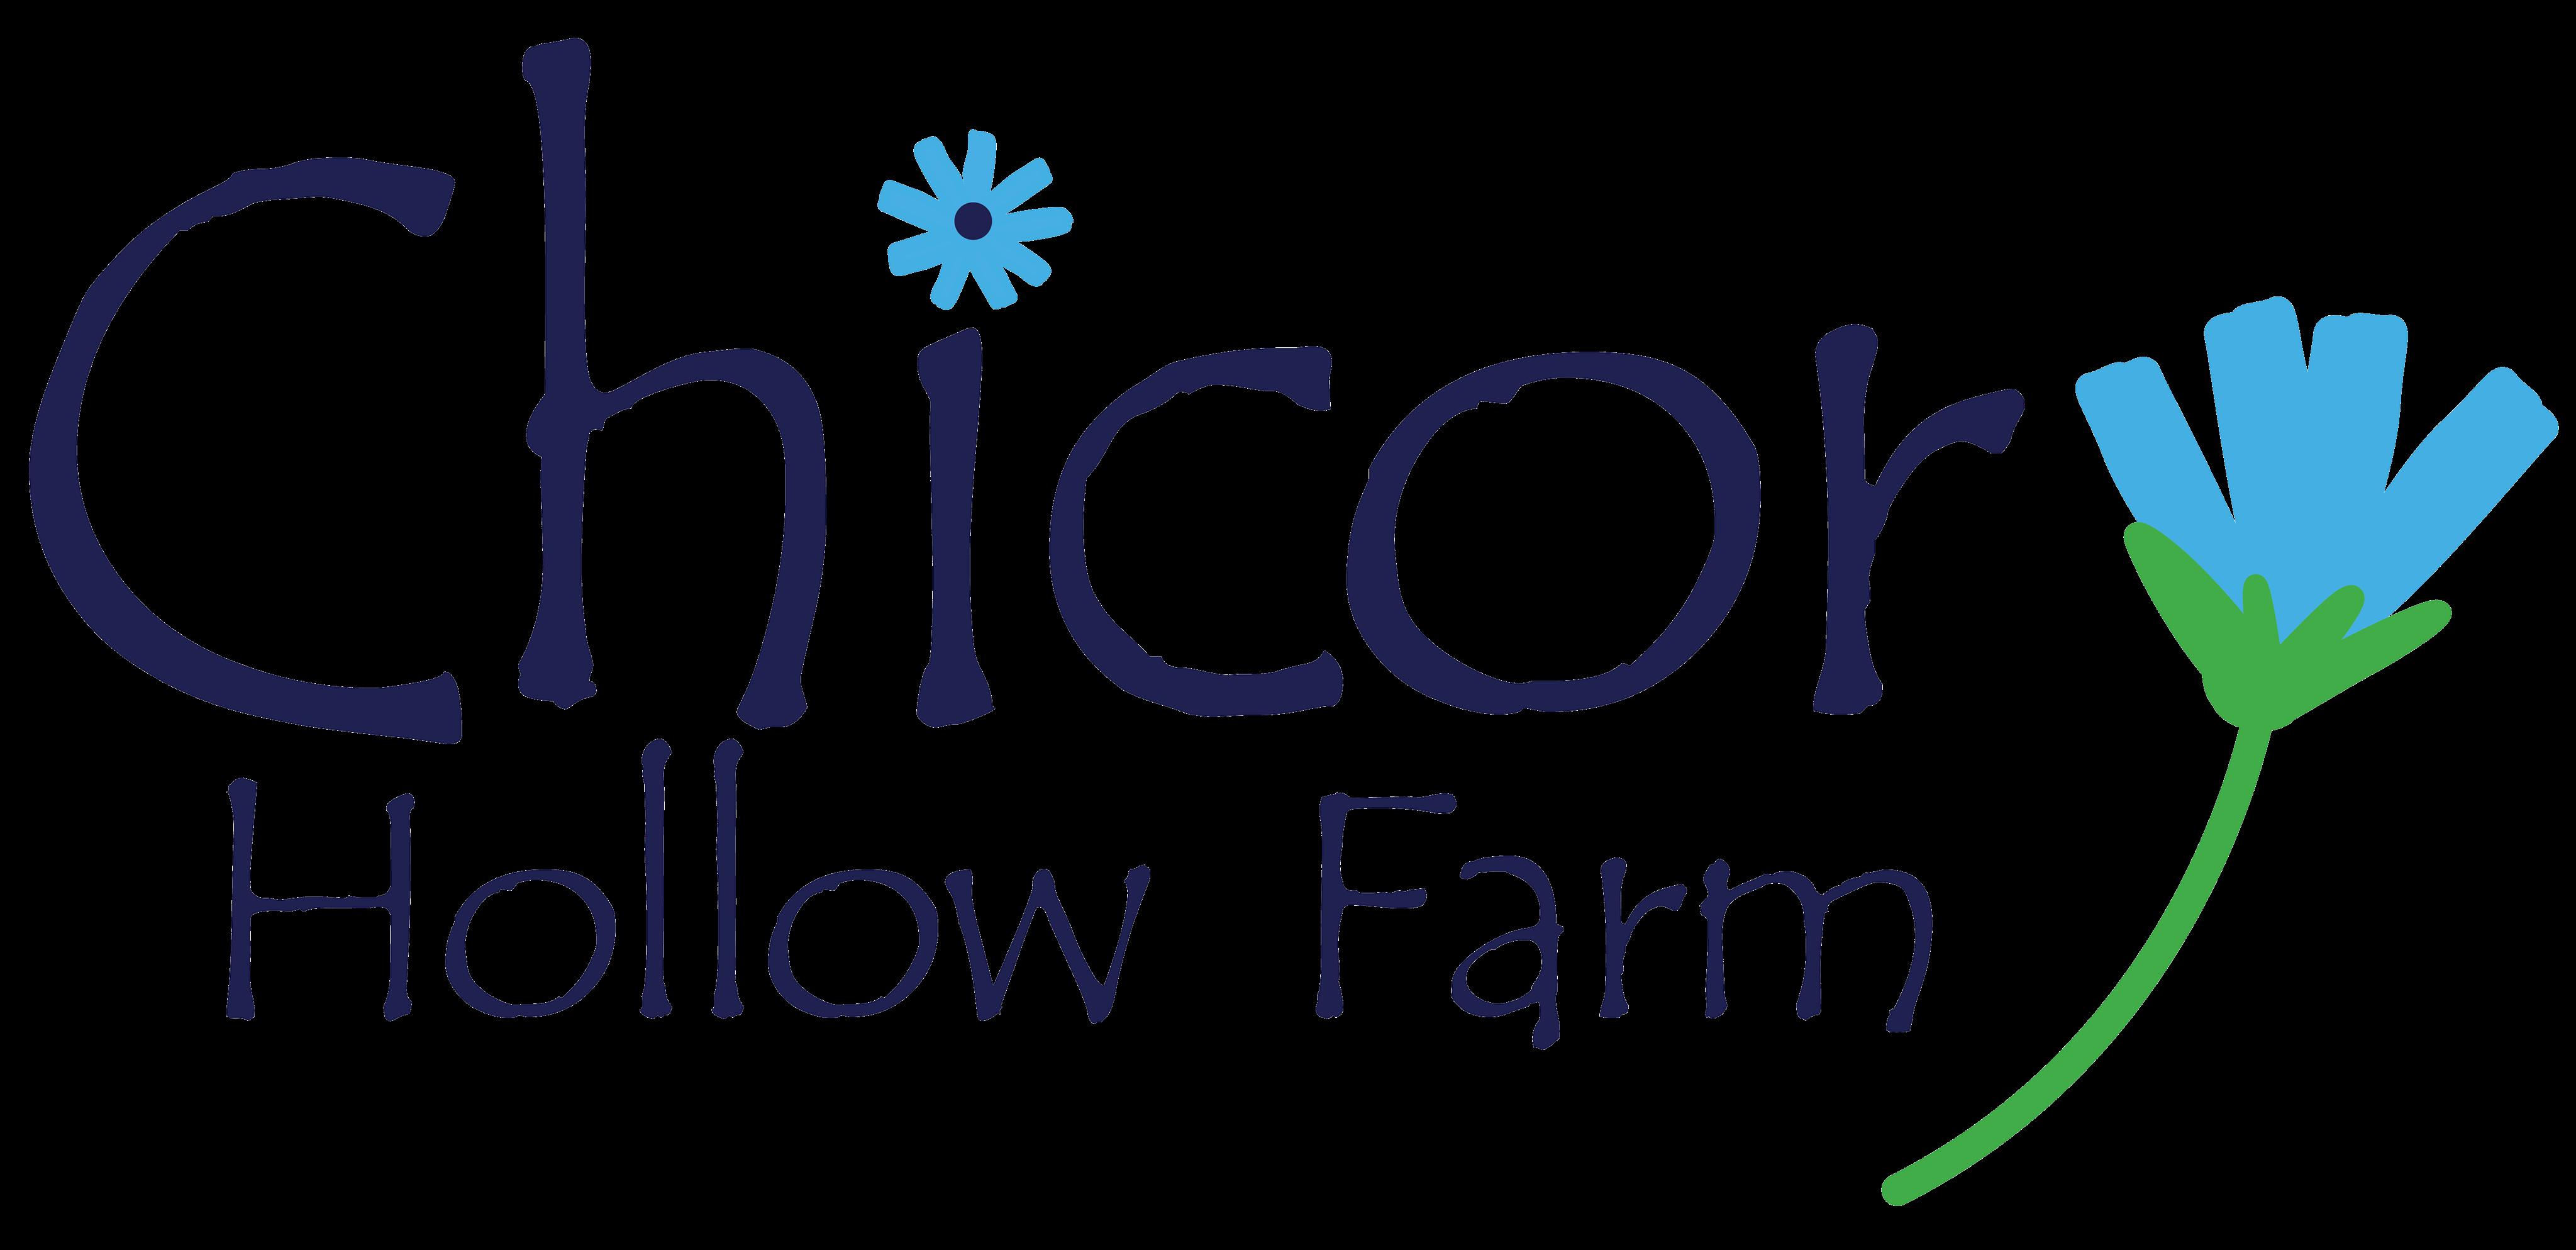 Chicory Hollow Farm